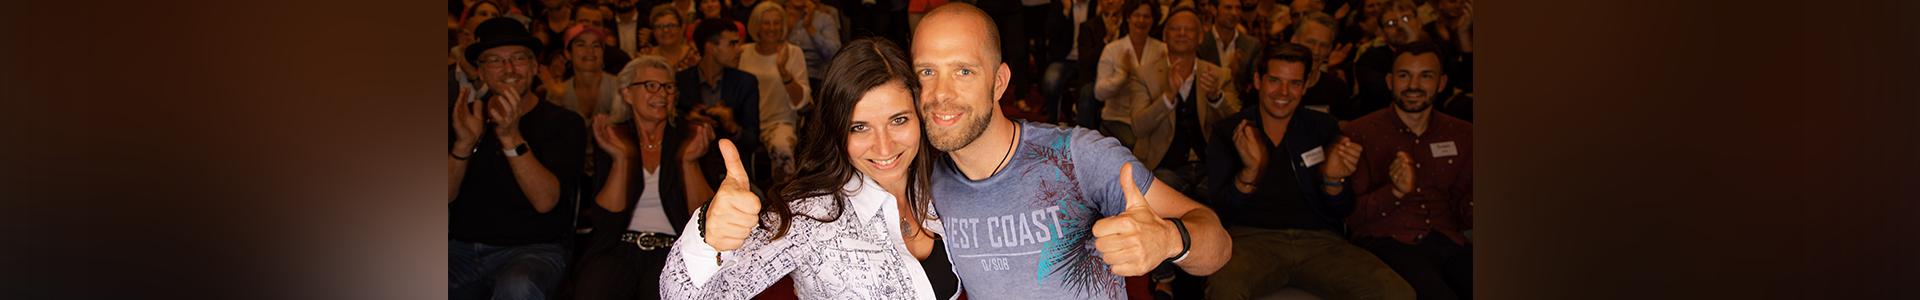 Expert Marketplace -  Nicole Pethke &  Christian Graßmann